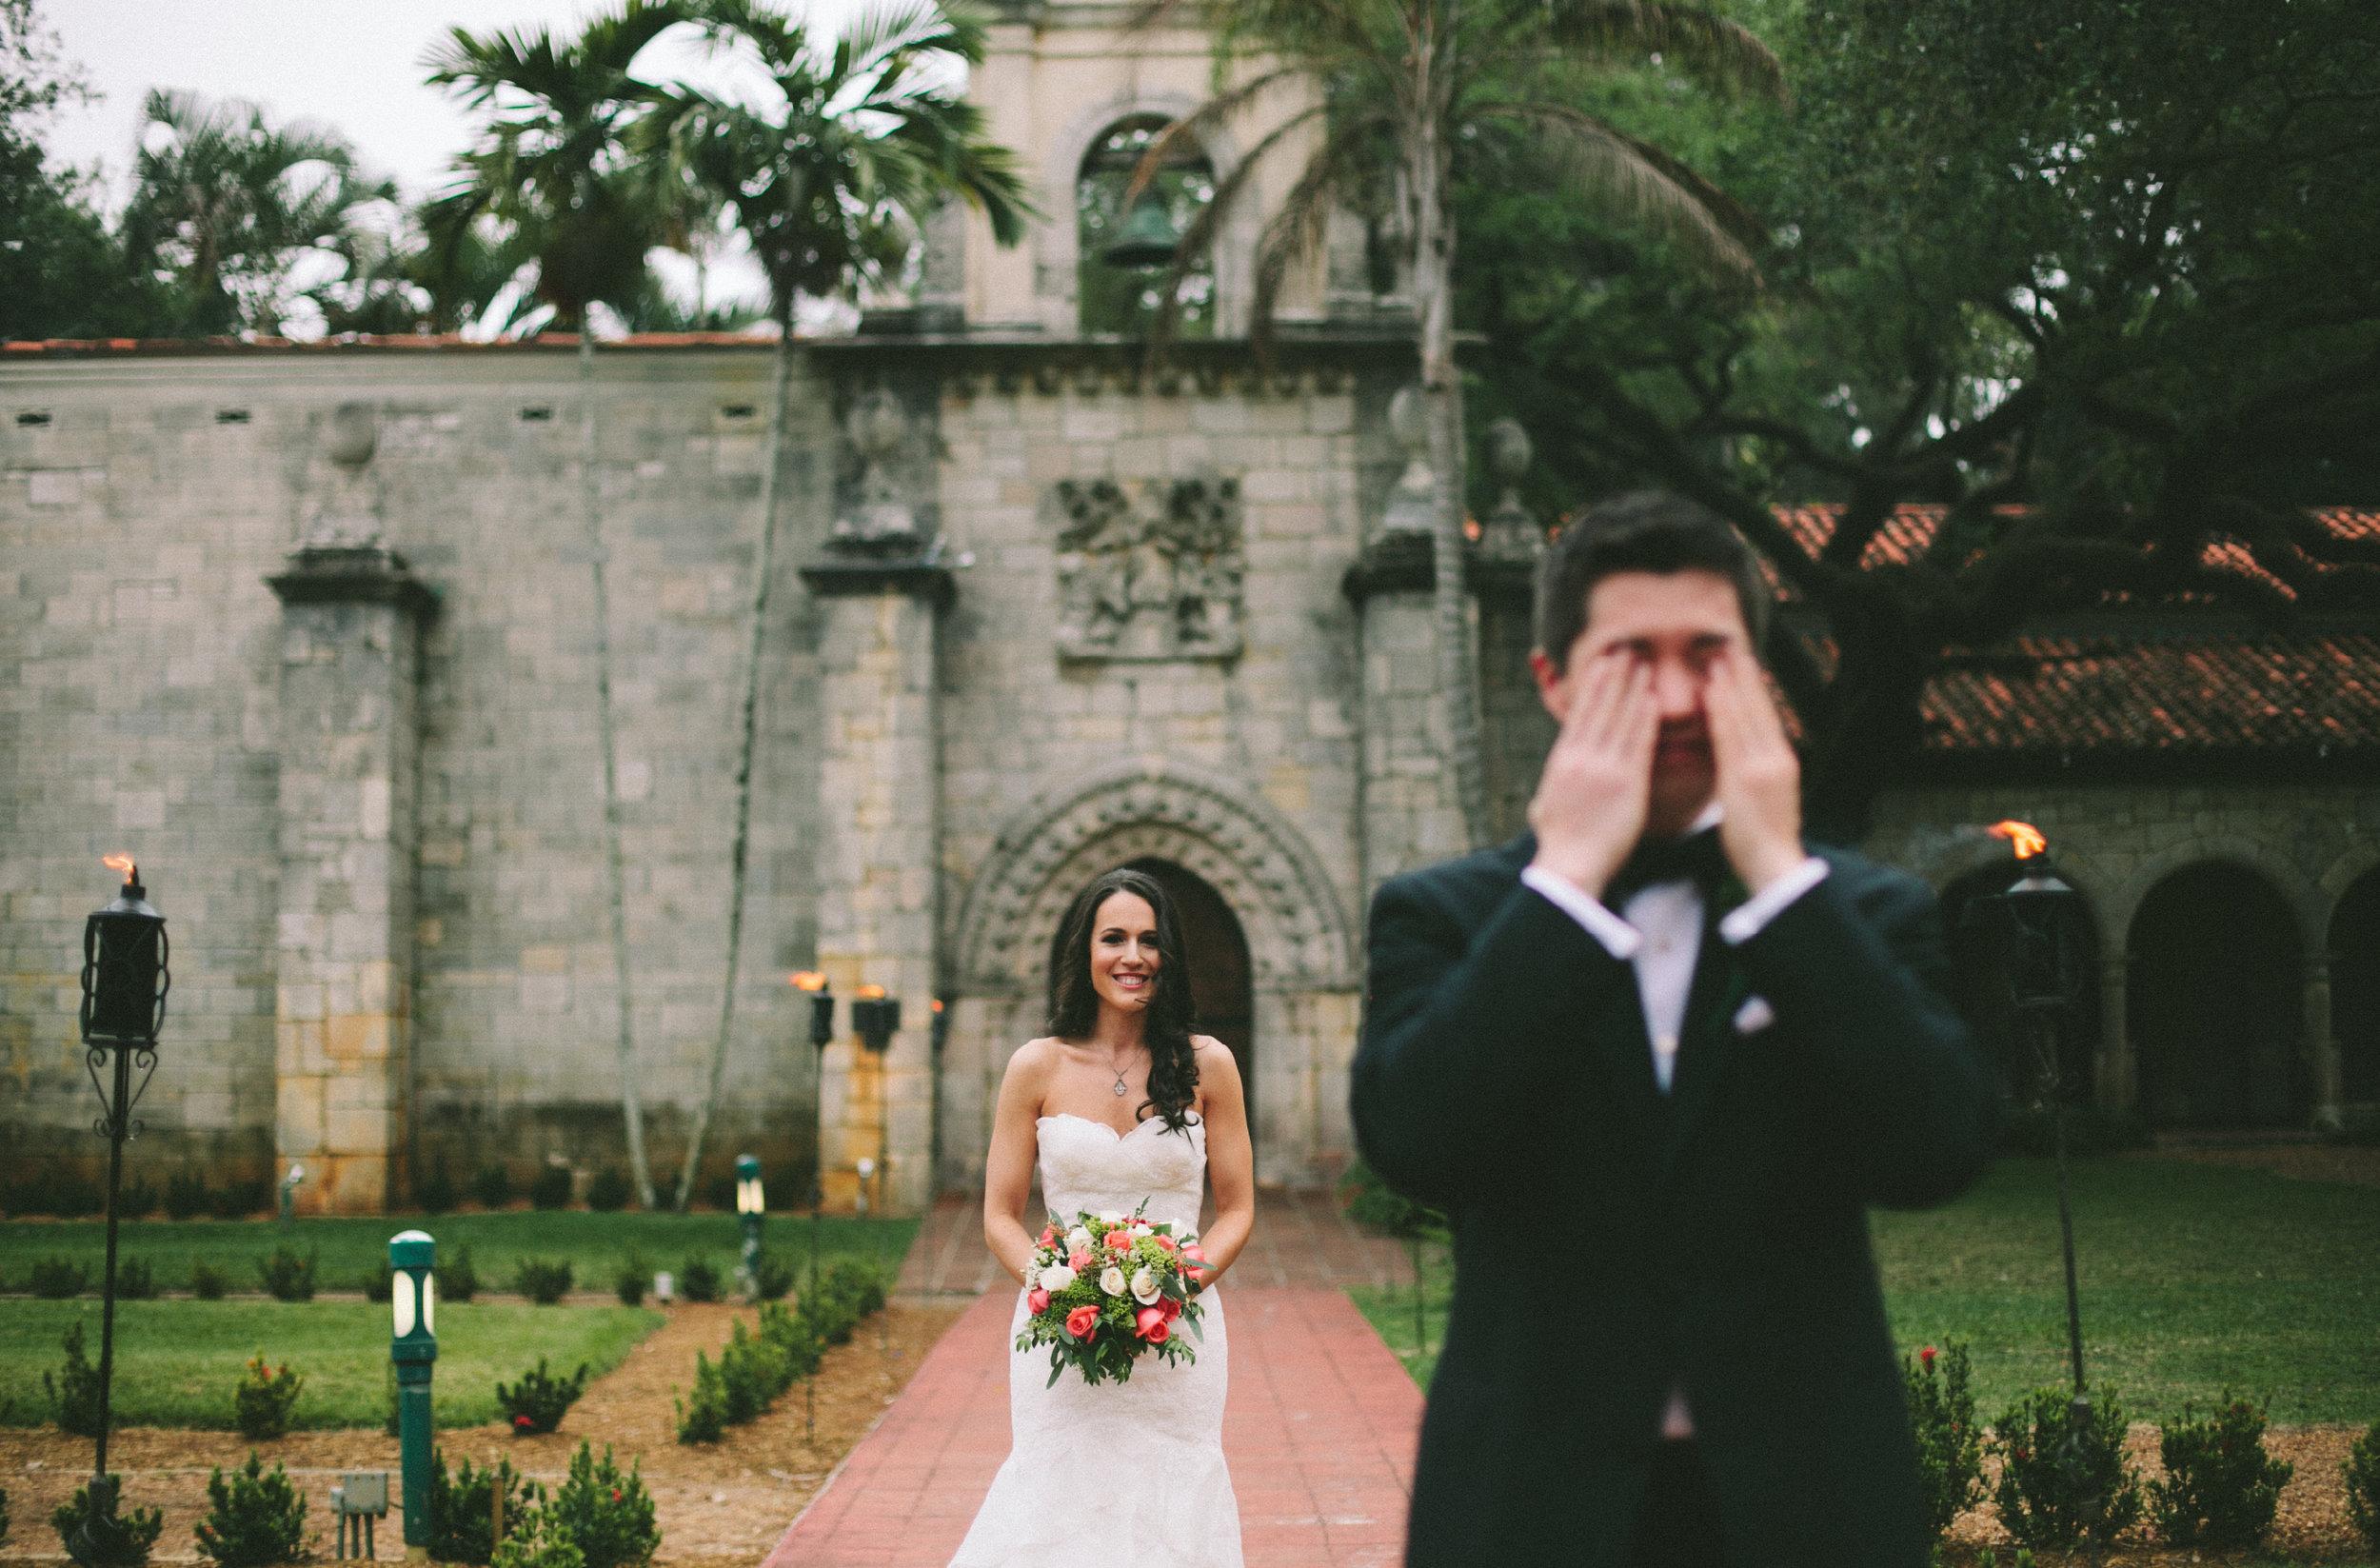 Wedding at the Spanish Monastery Miami Beach31.jpg